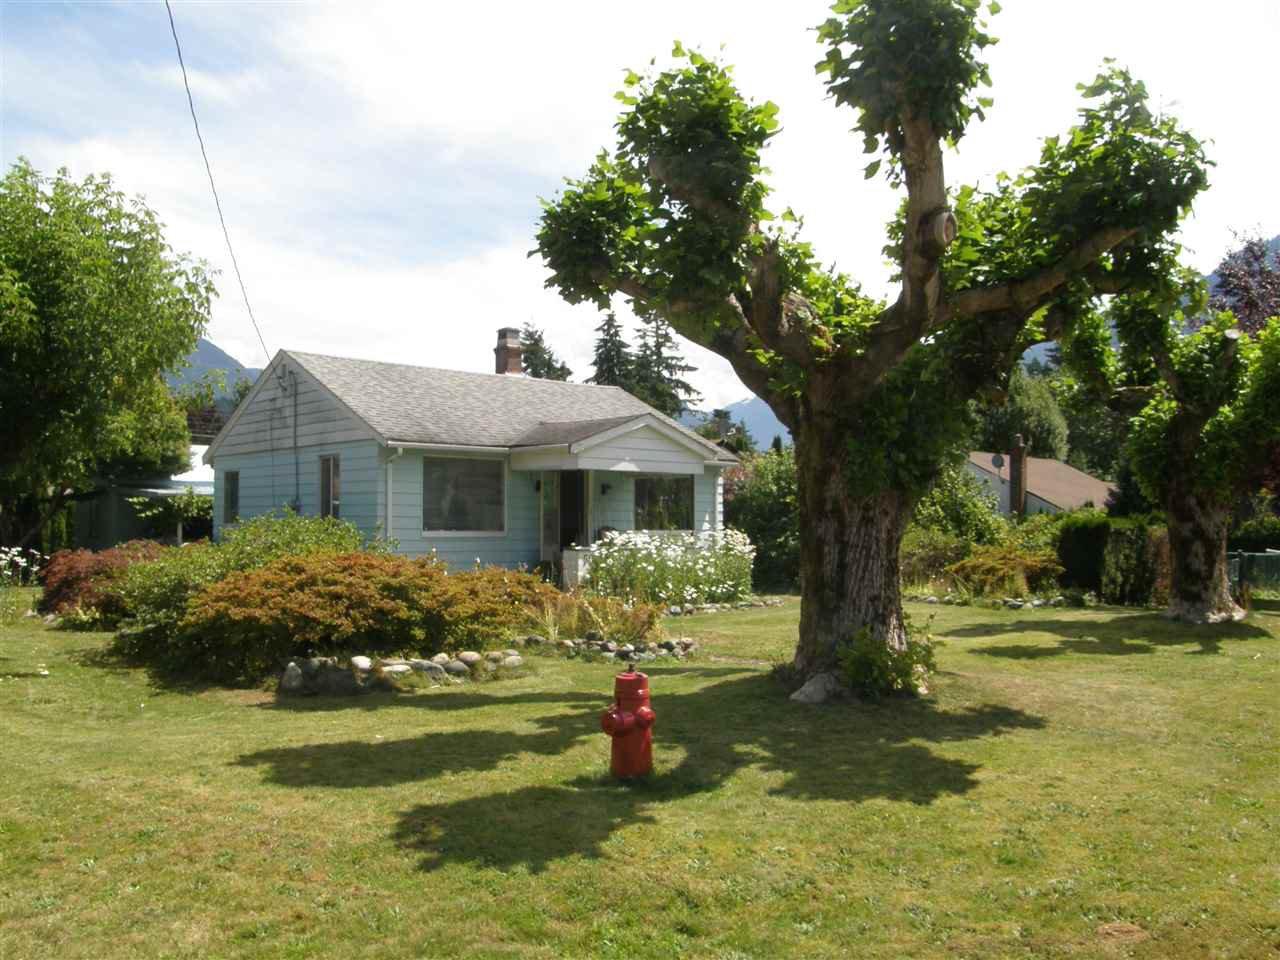 Main Photo: 509 FRASER Avenue in Hope: Hope Center House for sale : MLS®# R2092970